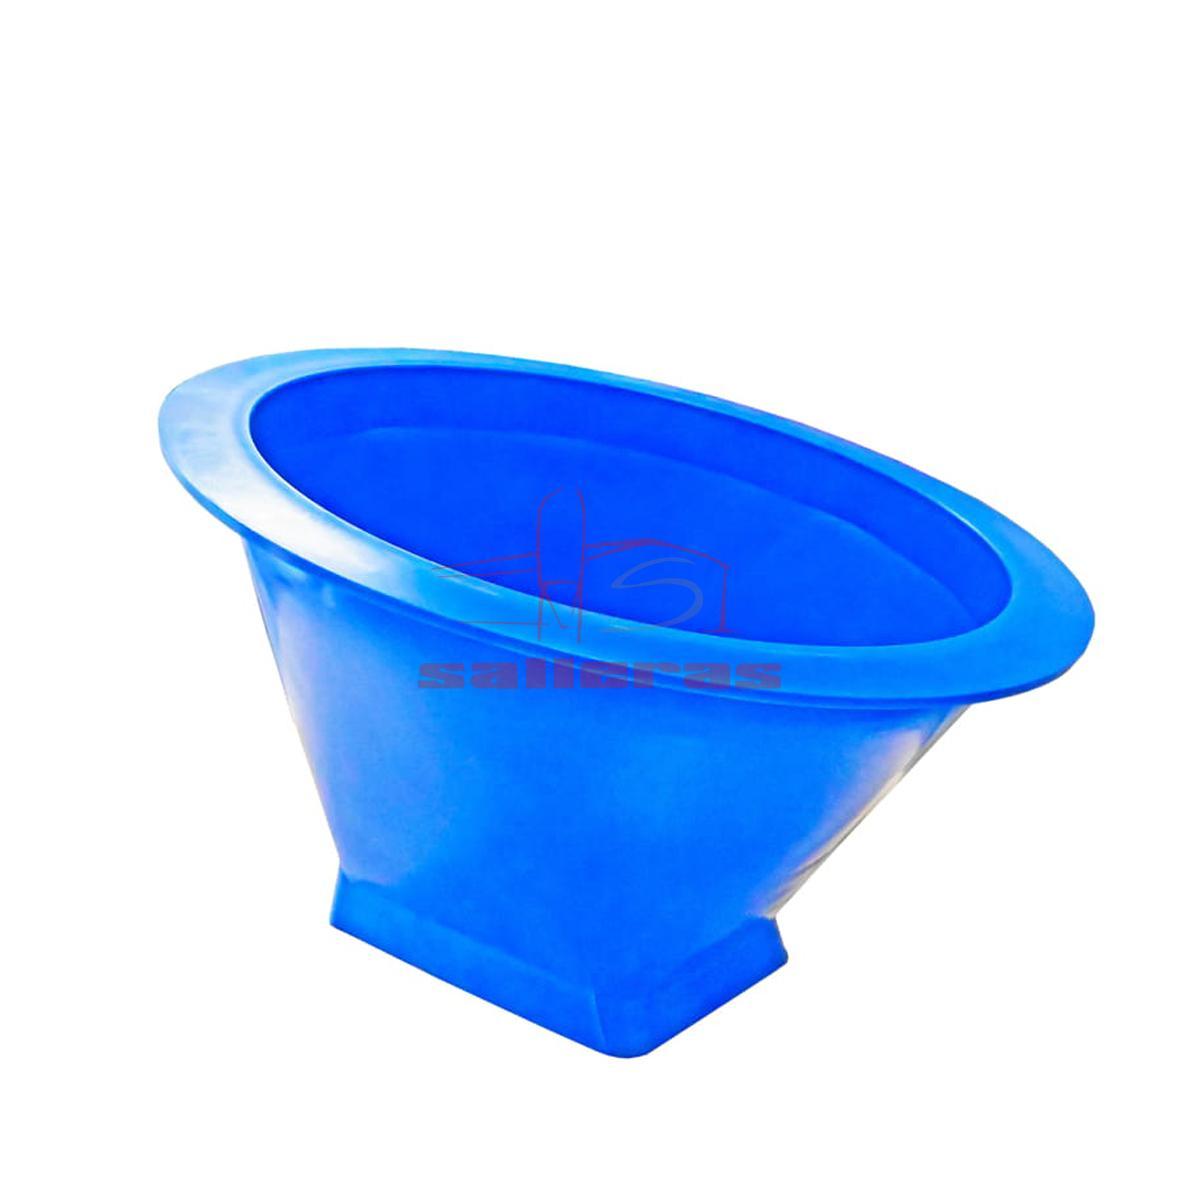 cono azul con boca cuadrada